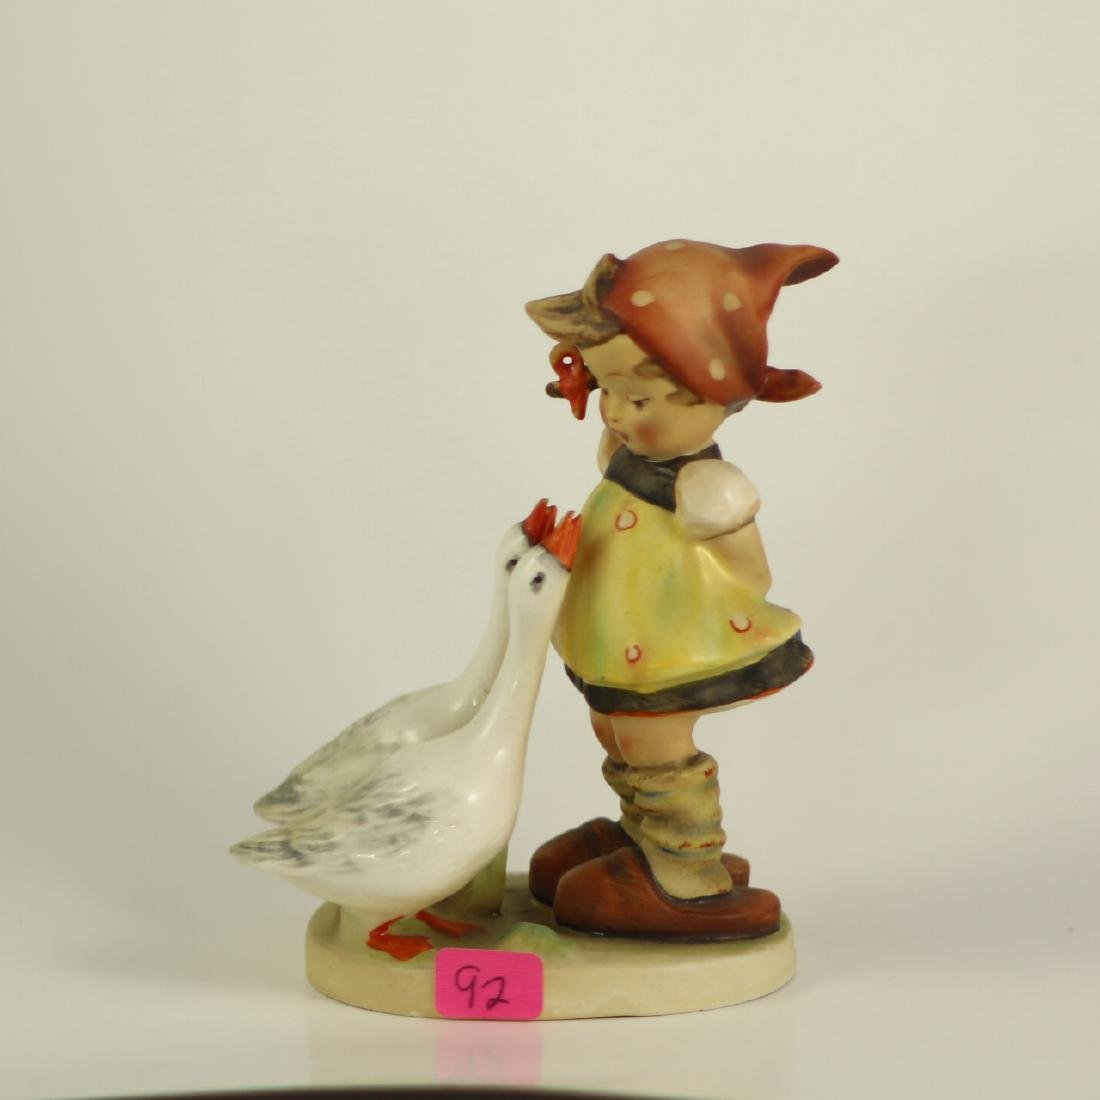 "Hummel Figurine 47/0 ""Goose Girl"" TMK 1 CROWN mark"